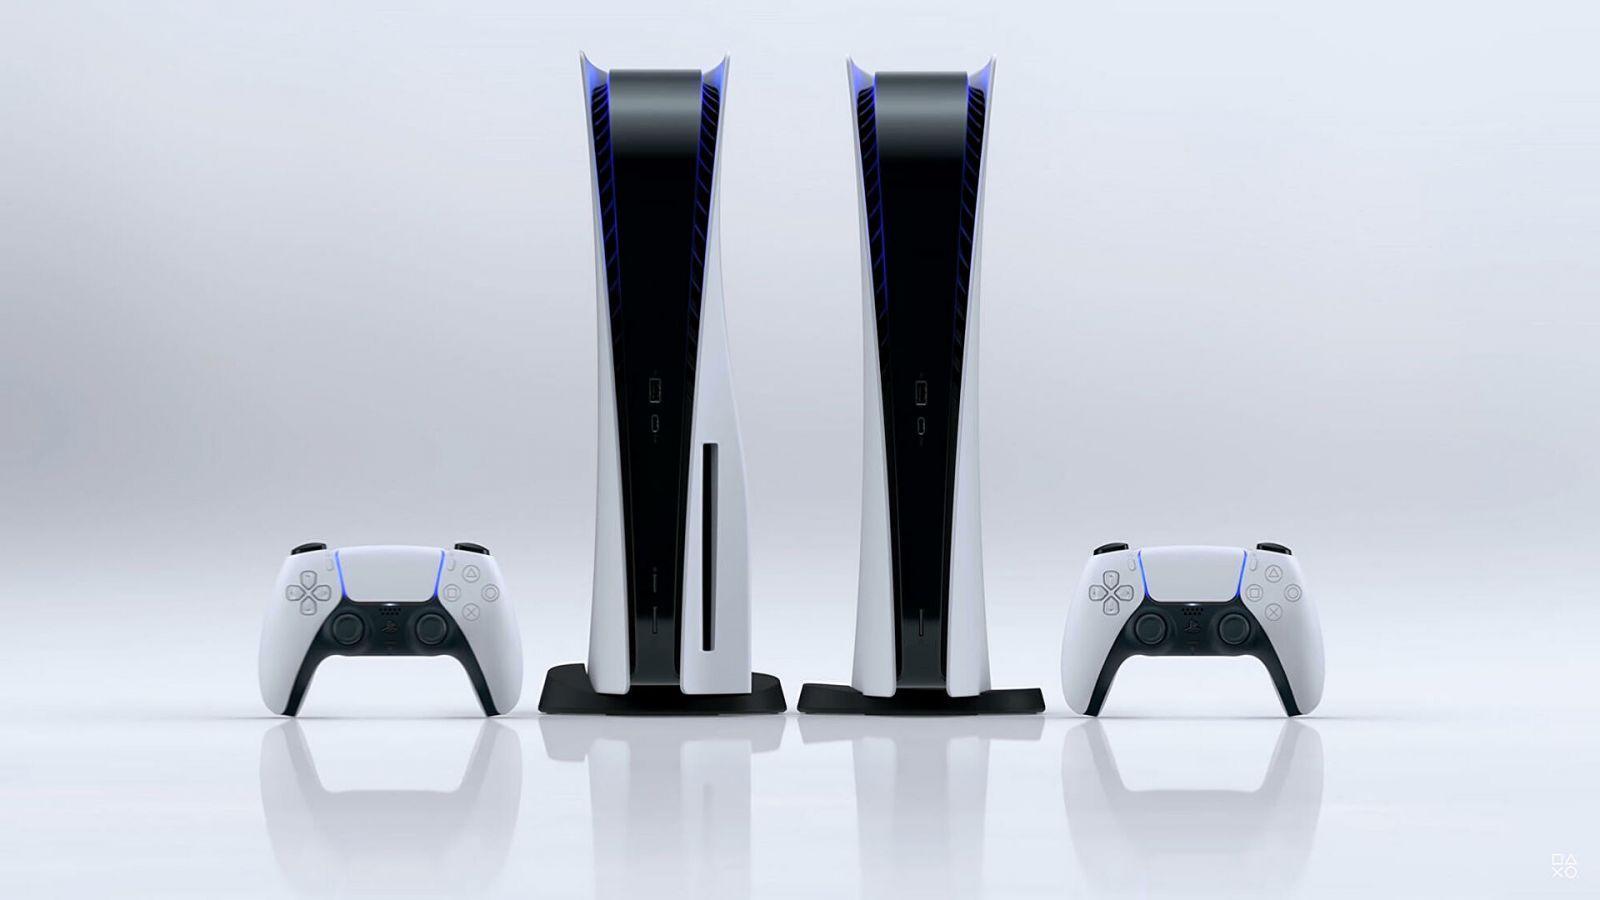 Цены и дата выхода Sony PlayStation 5